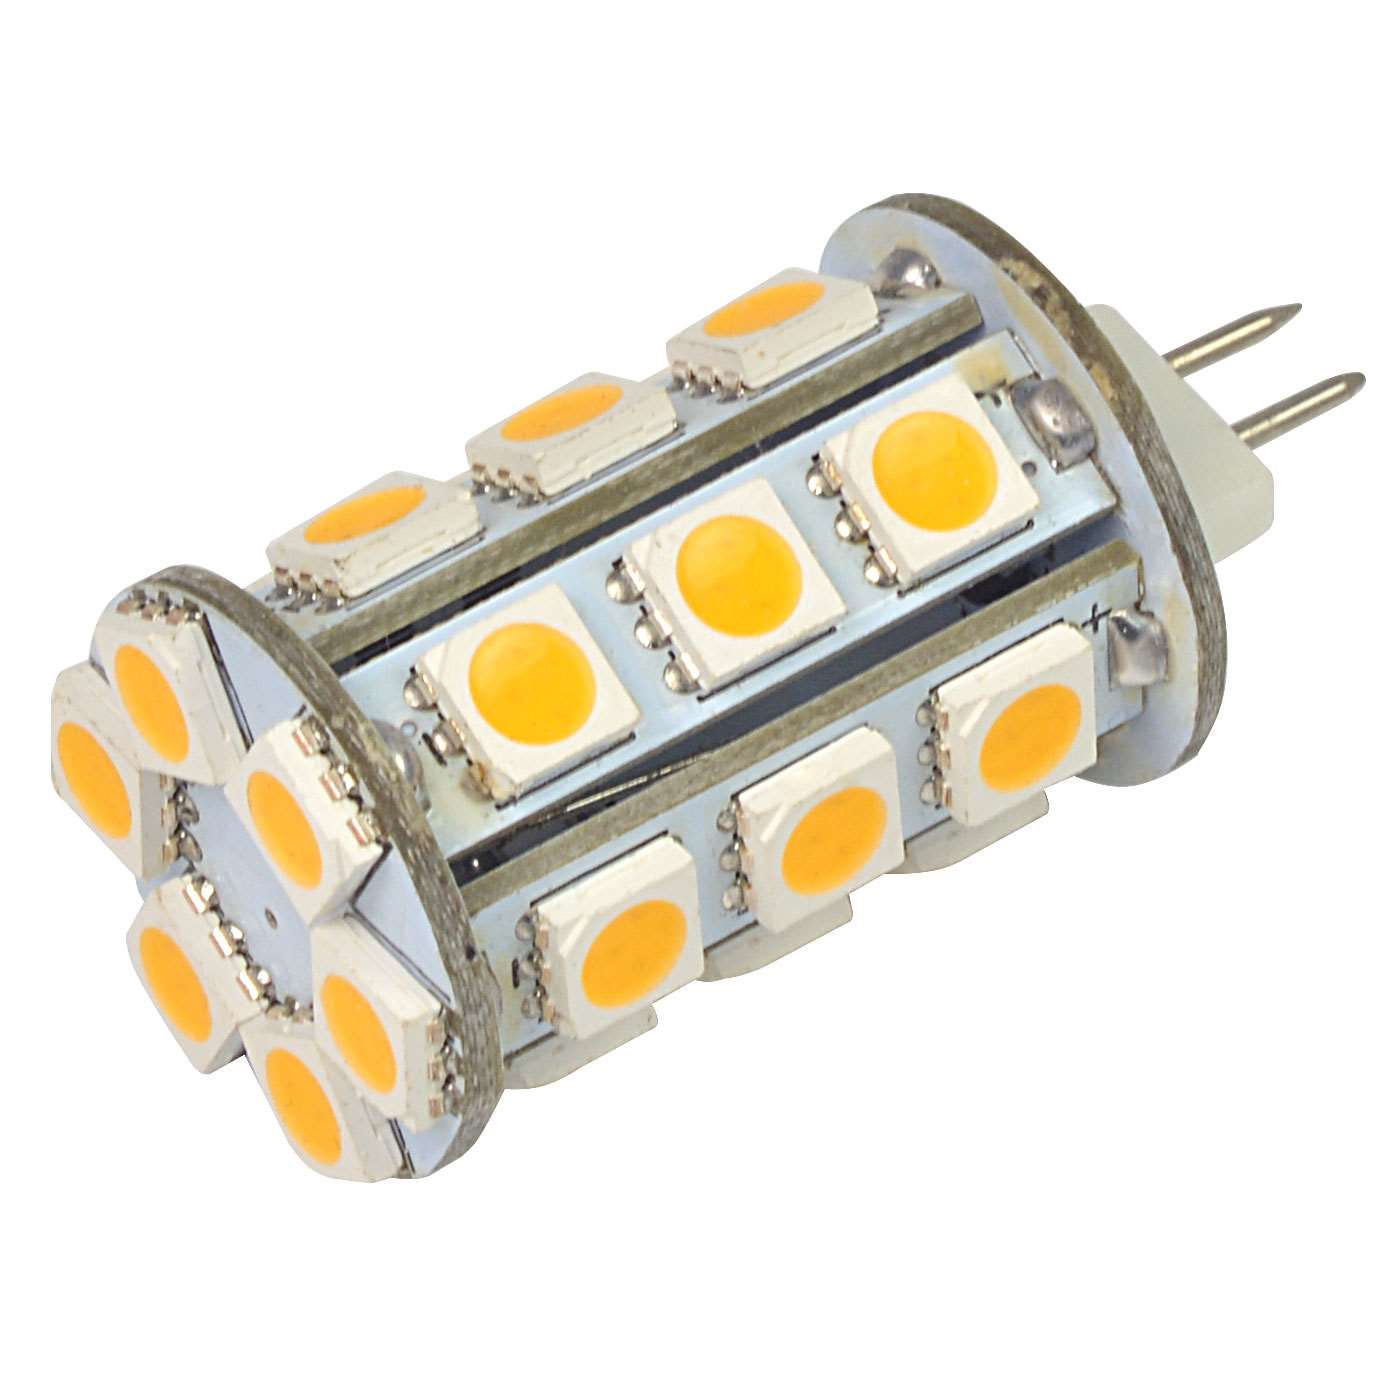 mengsled mengs g4 4w led light 24x 5050 smd leds led bulb in warm white cool white energy. Black Bedroom Furniture Sets. Home Design Ideas